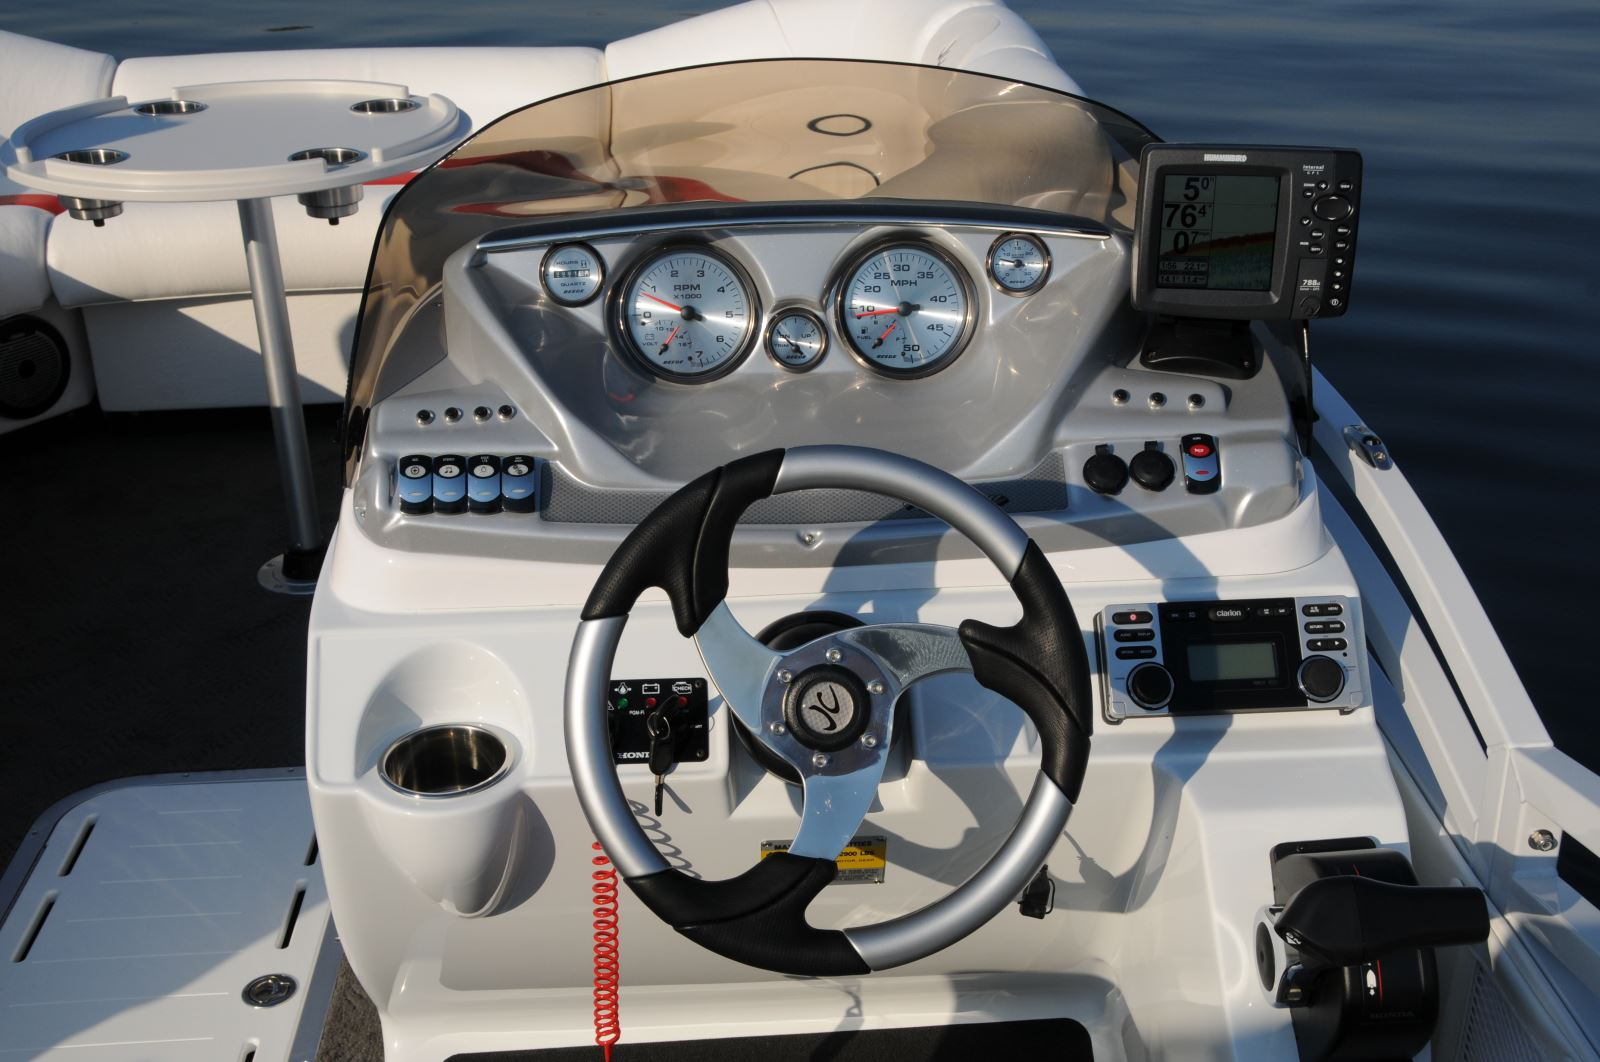 Boating Electronics Best installation practices   Pontoon